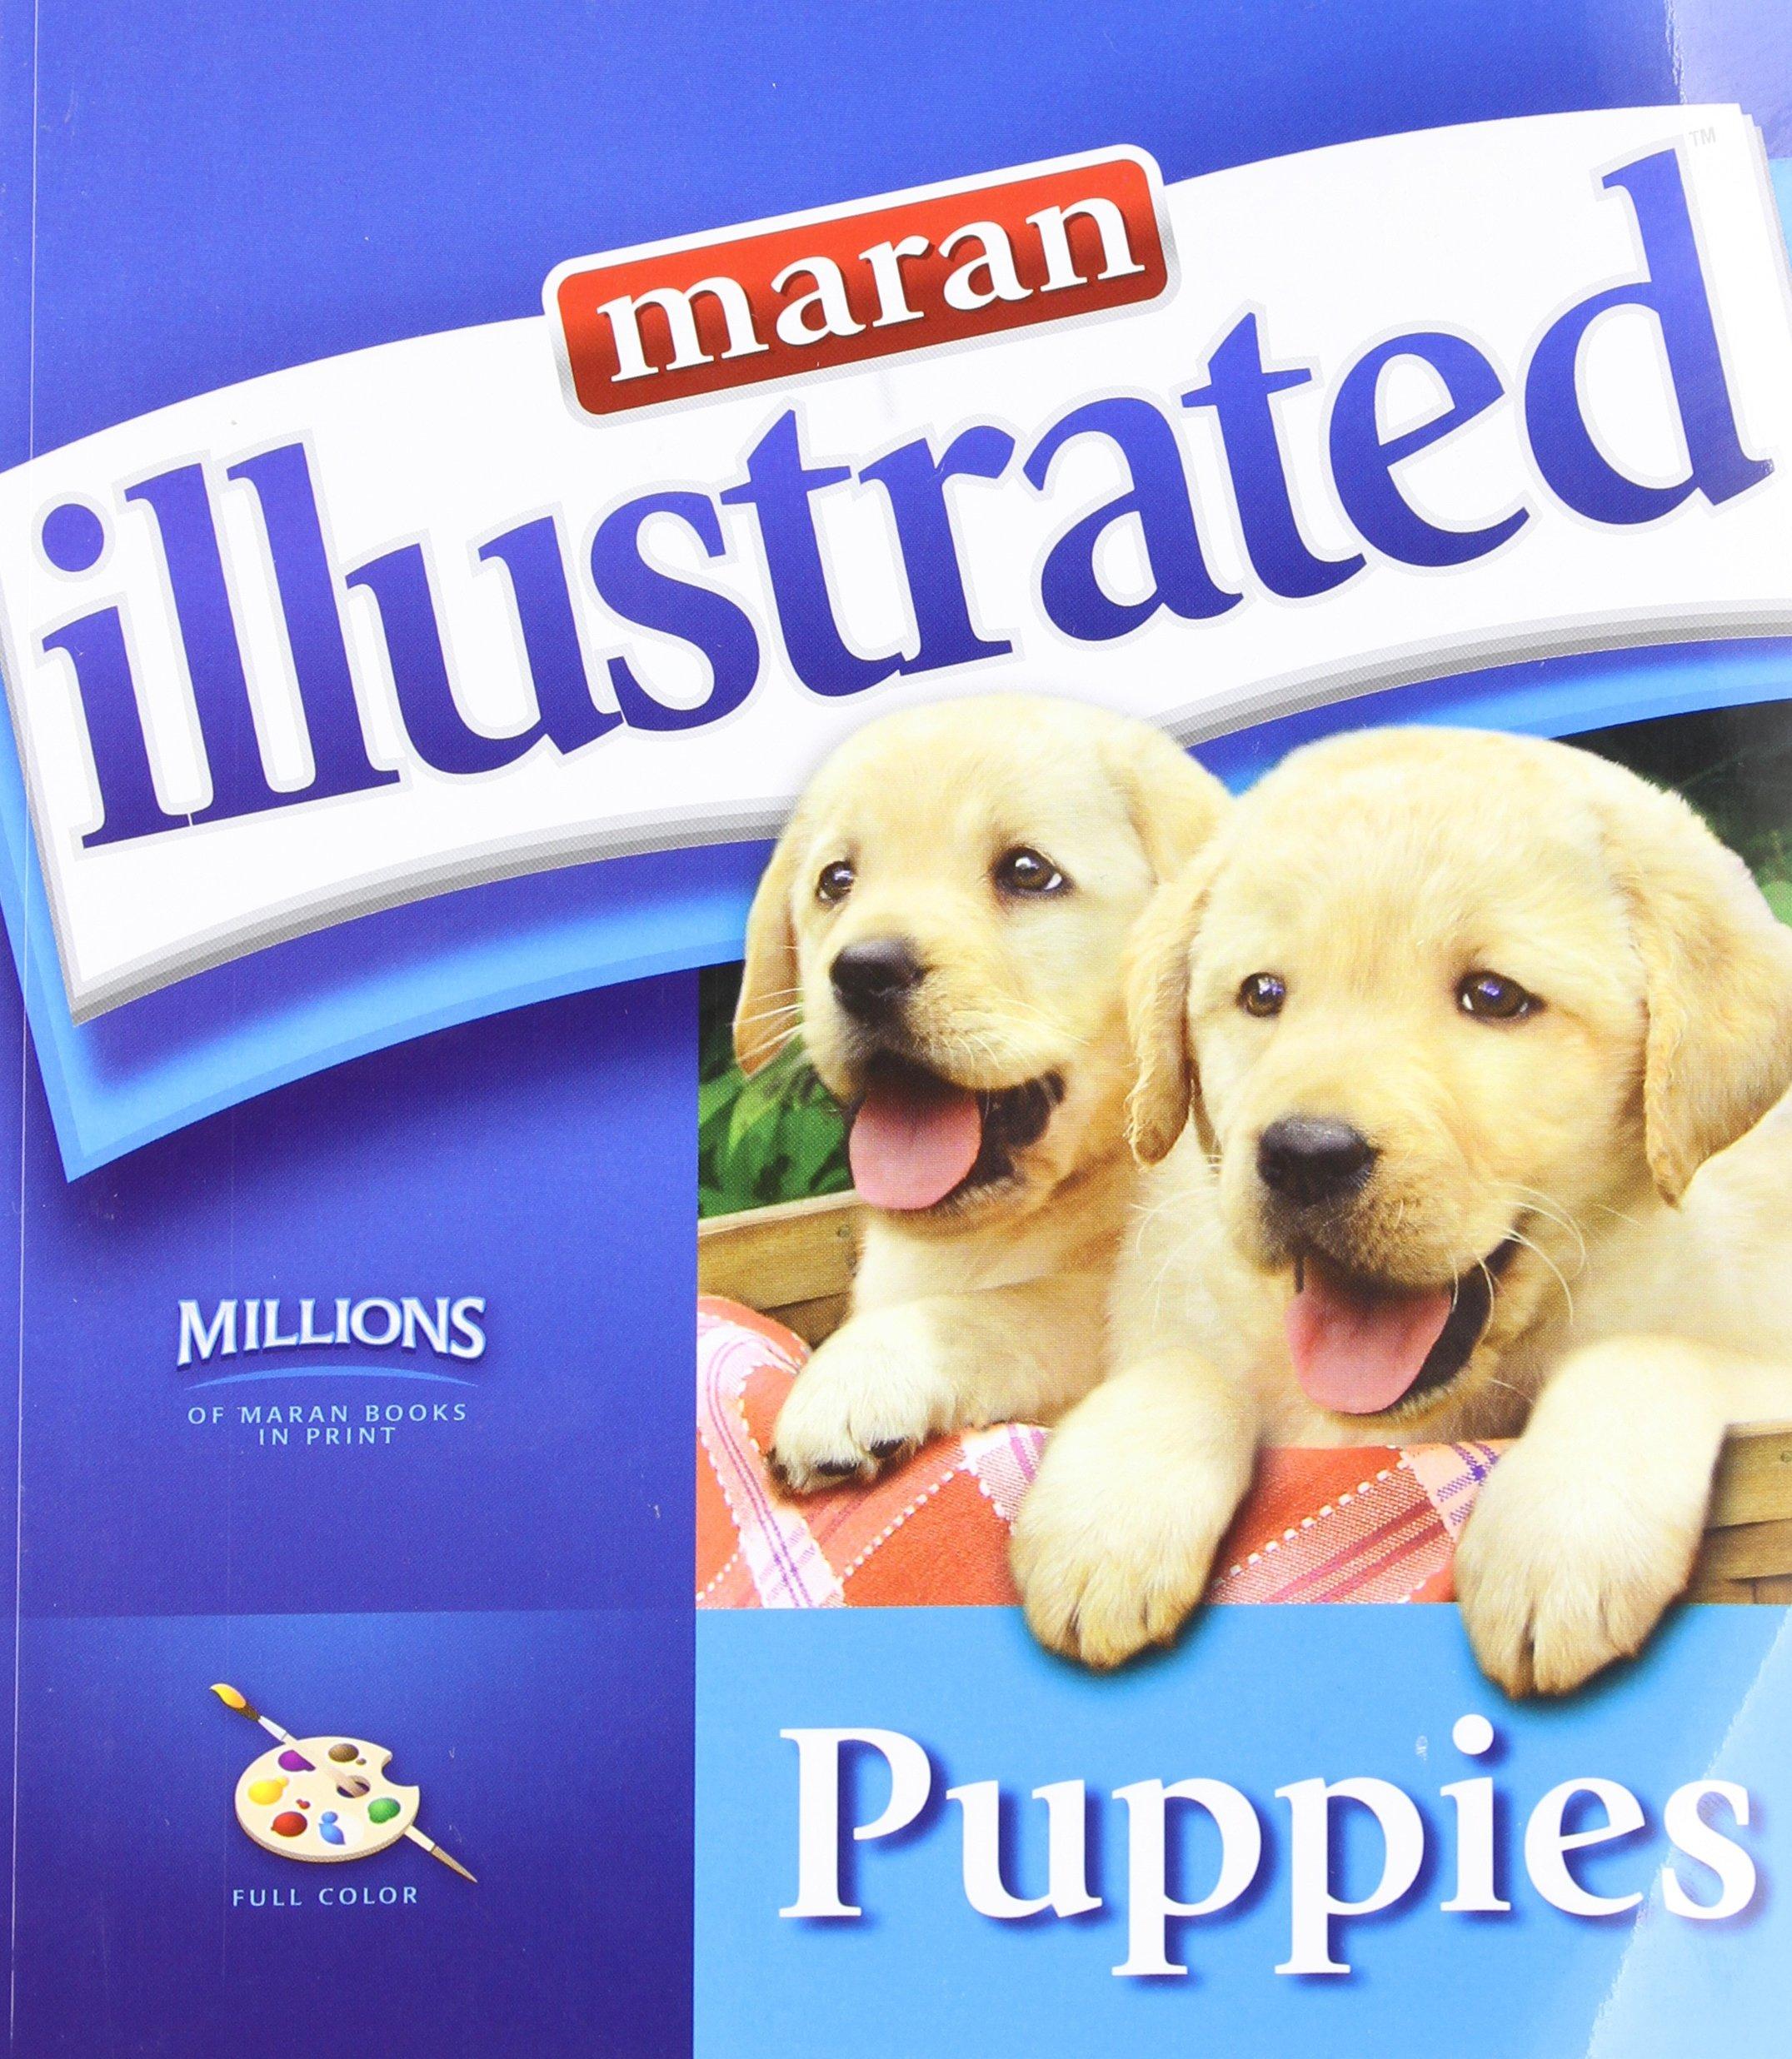 Read Online Maran Illustrated: Puppies pdf epub